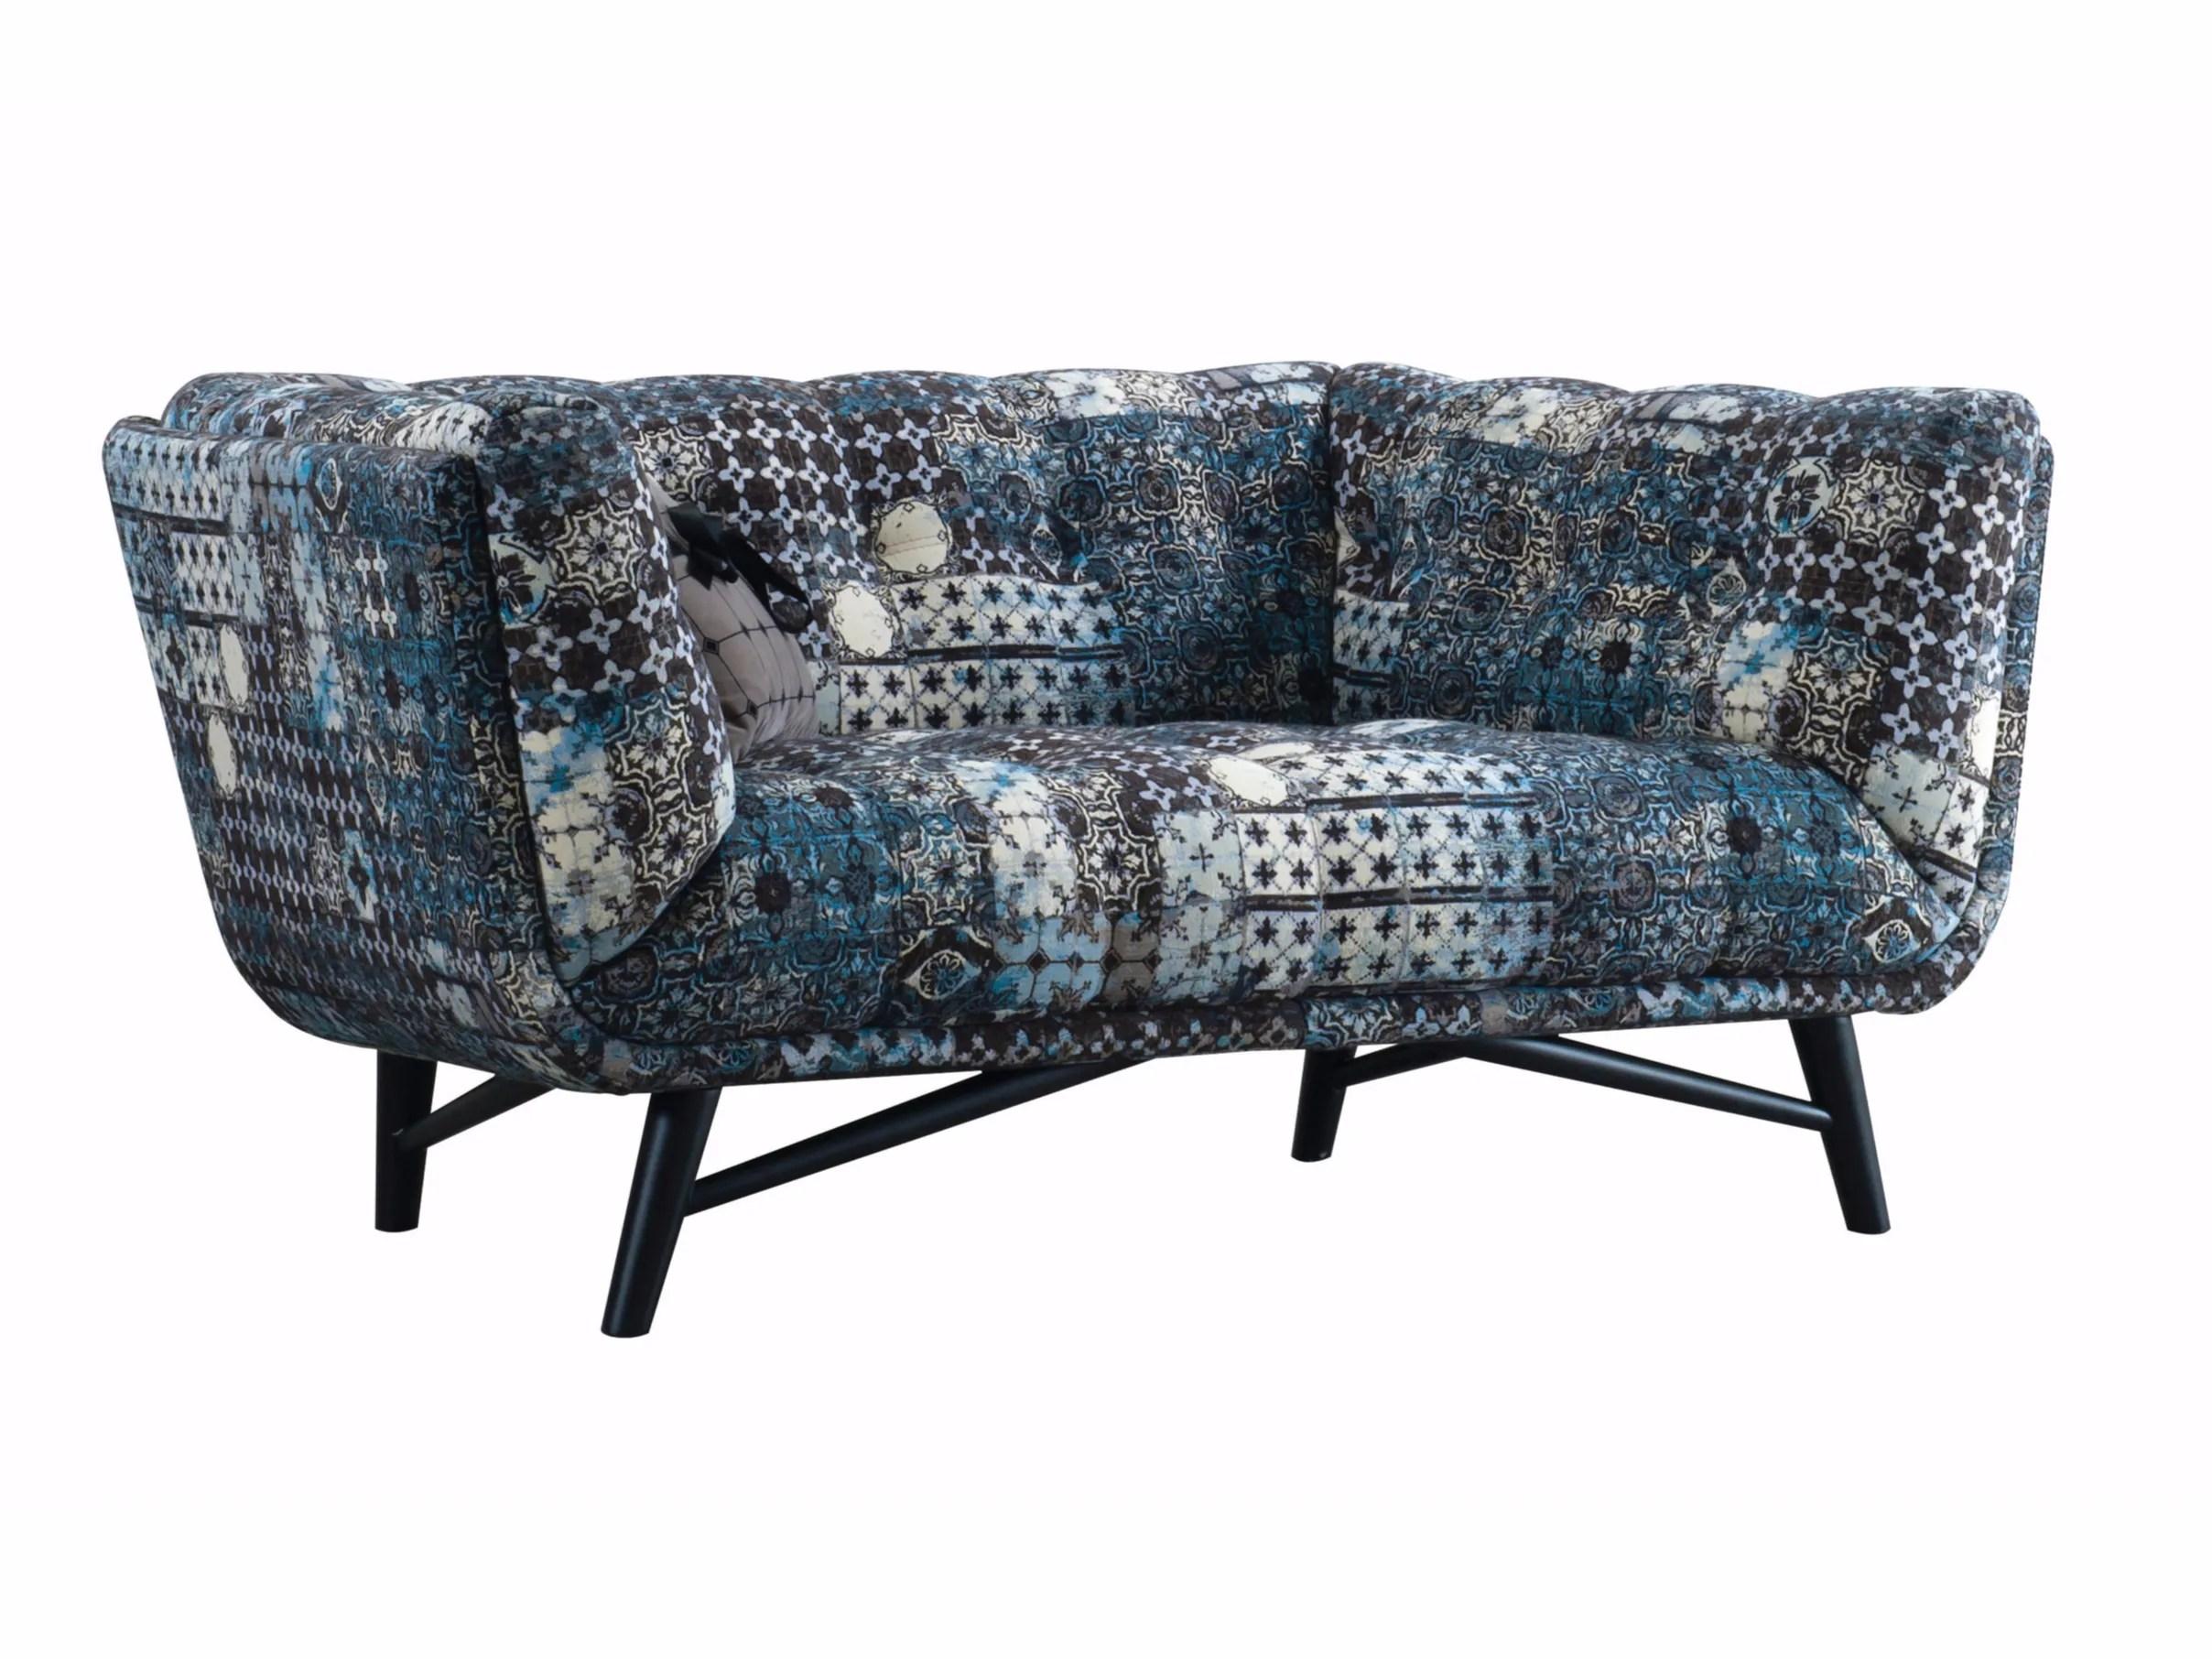 bubble sofa sacha lakic cheapest corner sofas roche bobois mah jong modular in